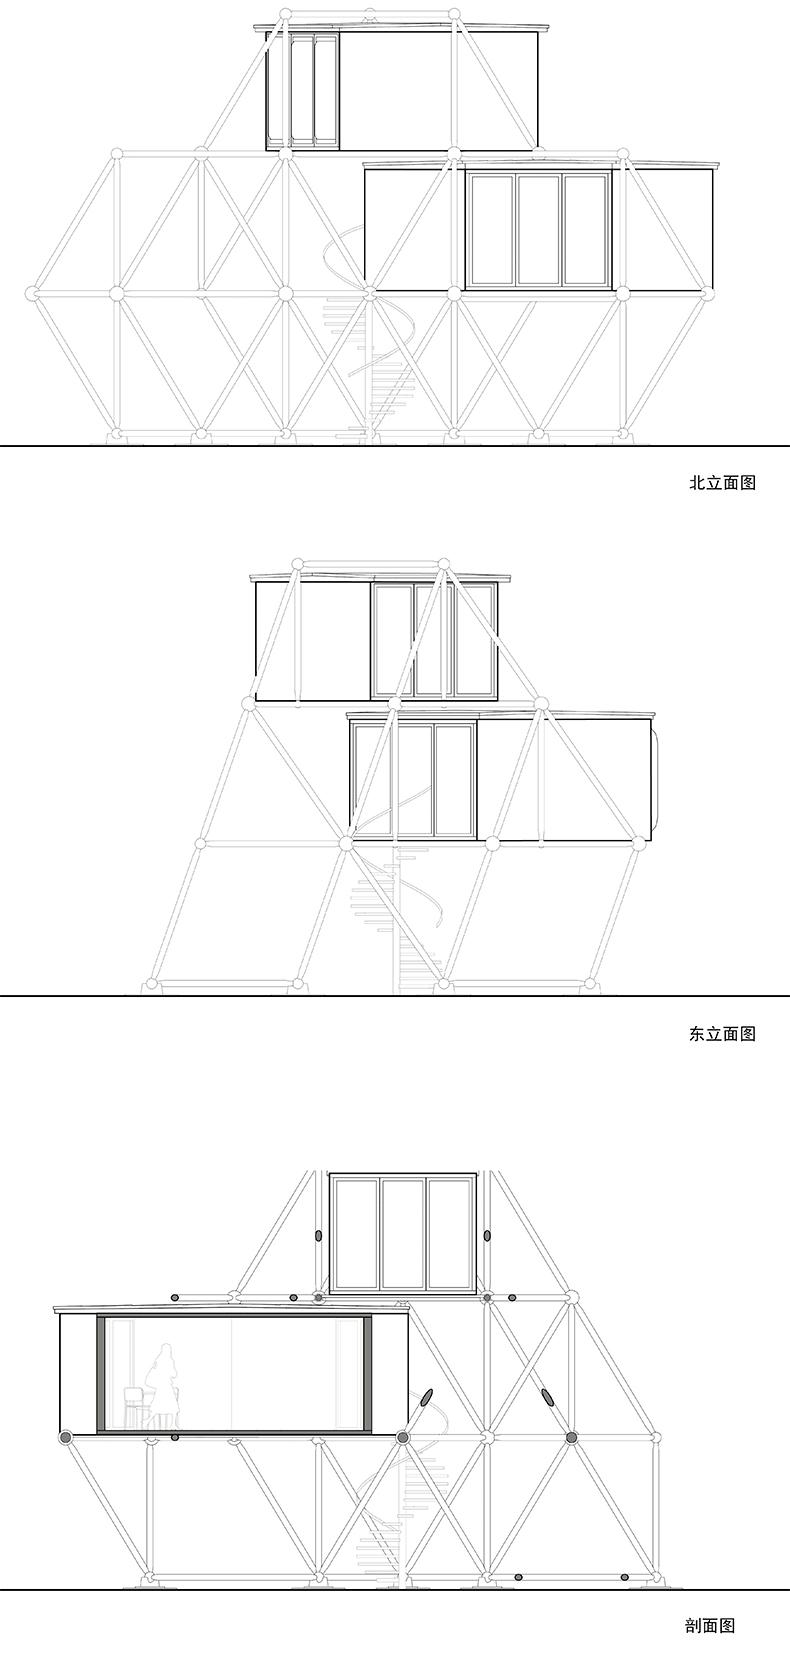 Plugin Tower 13